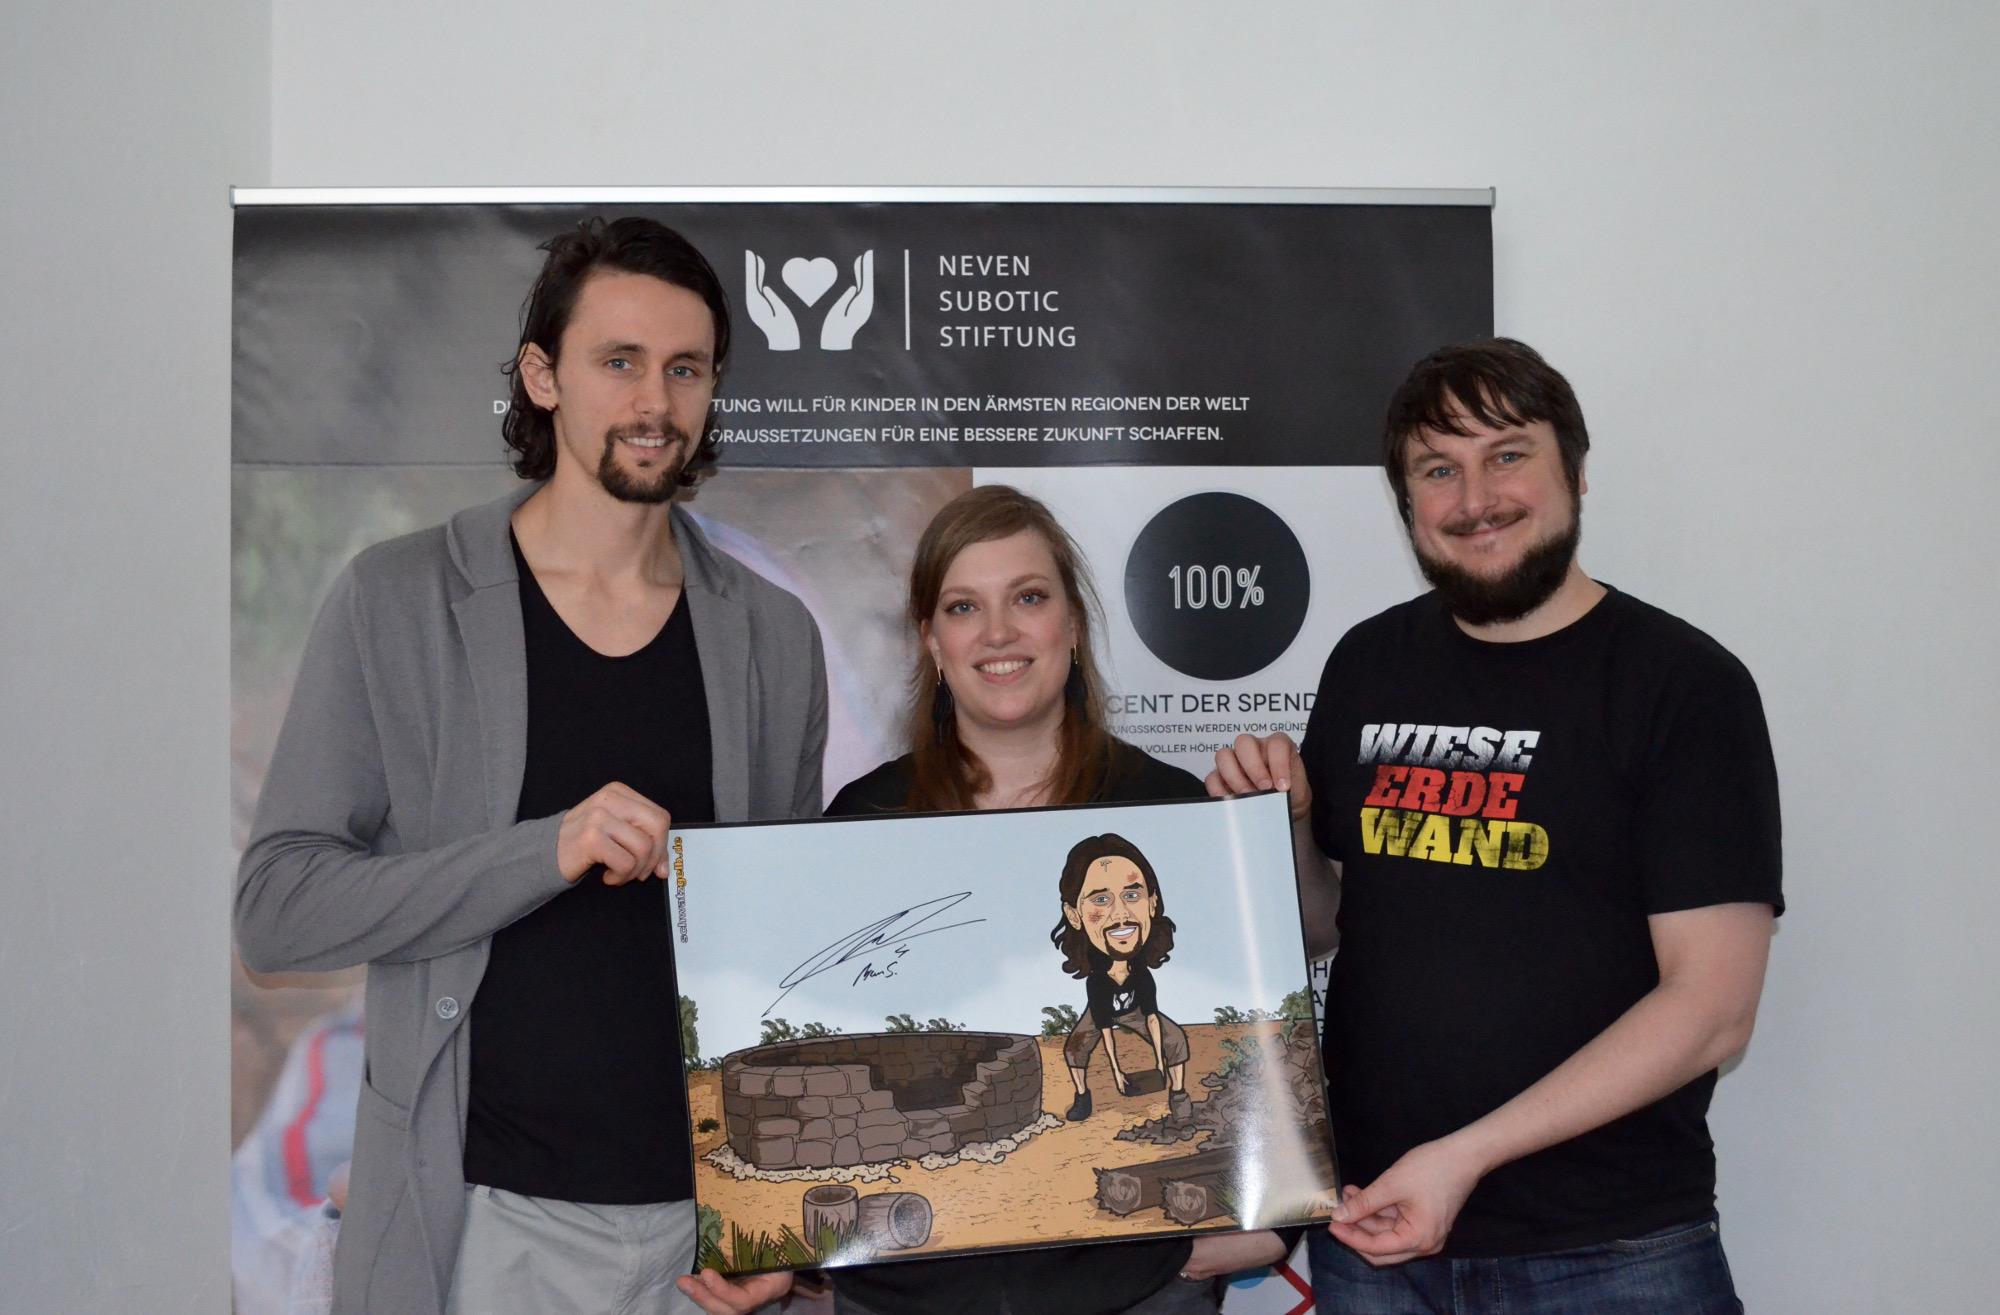 Neven übergibt das Poster an Annika